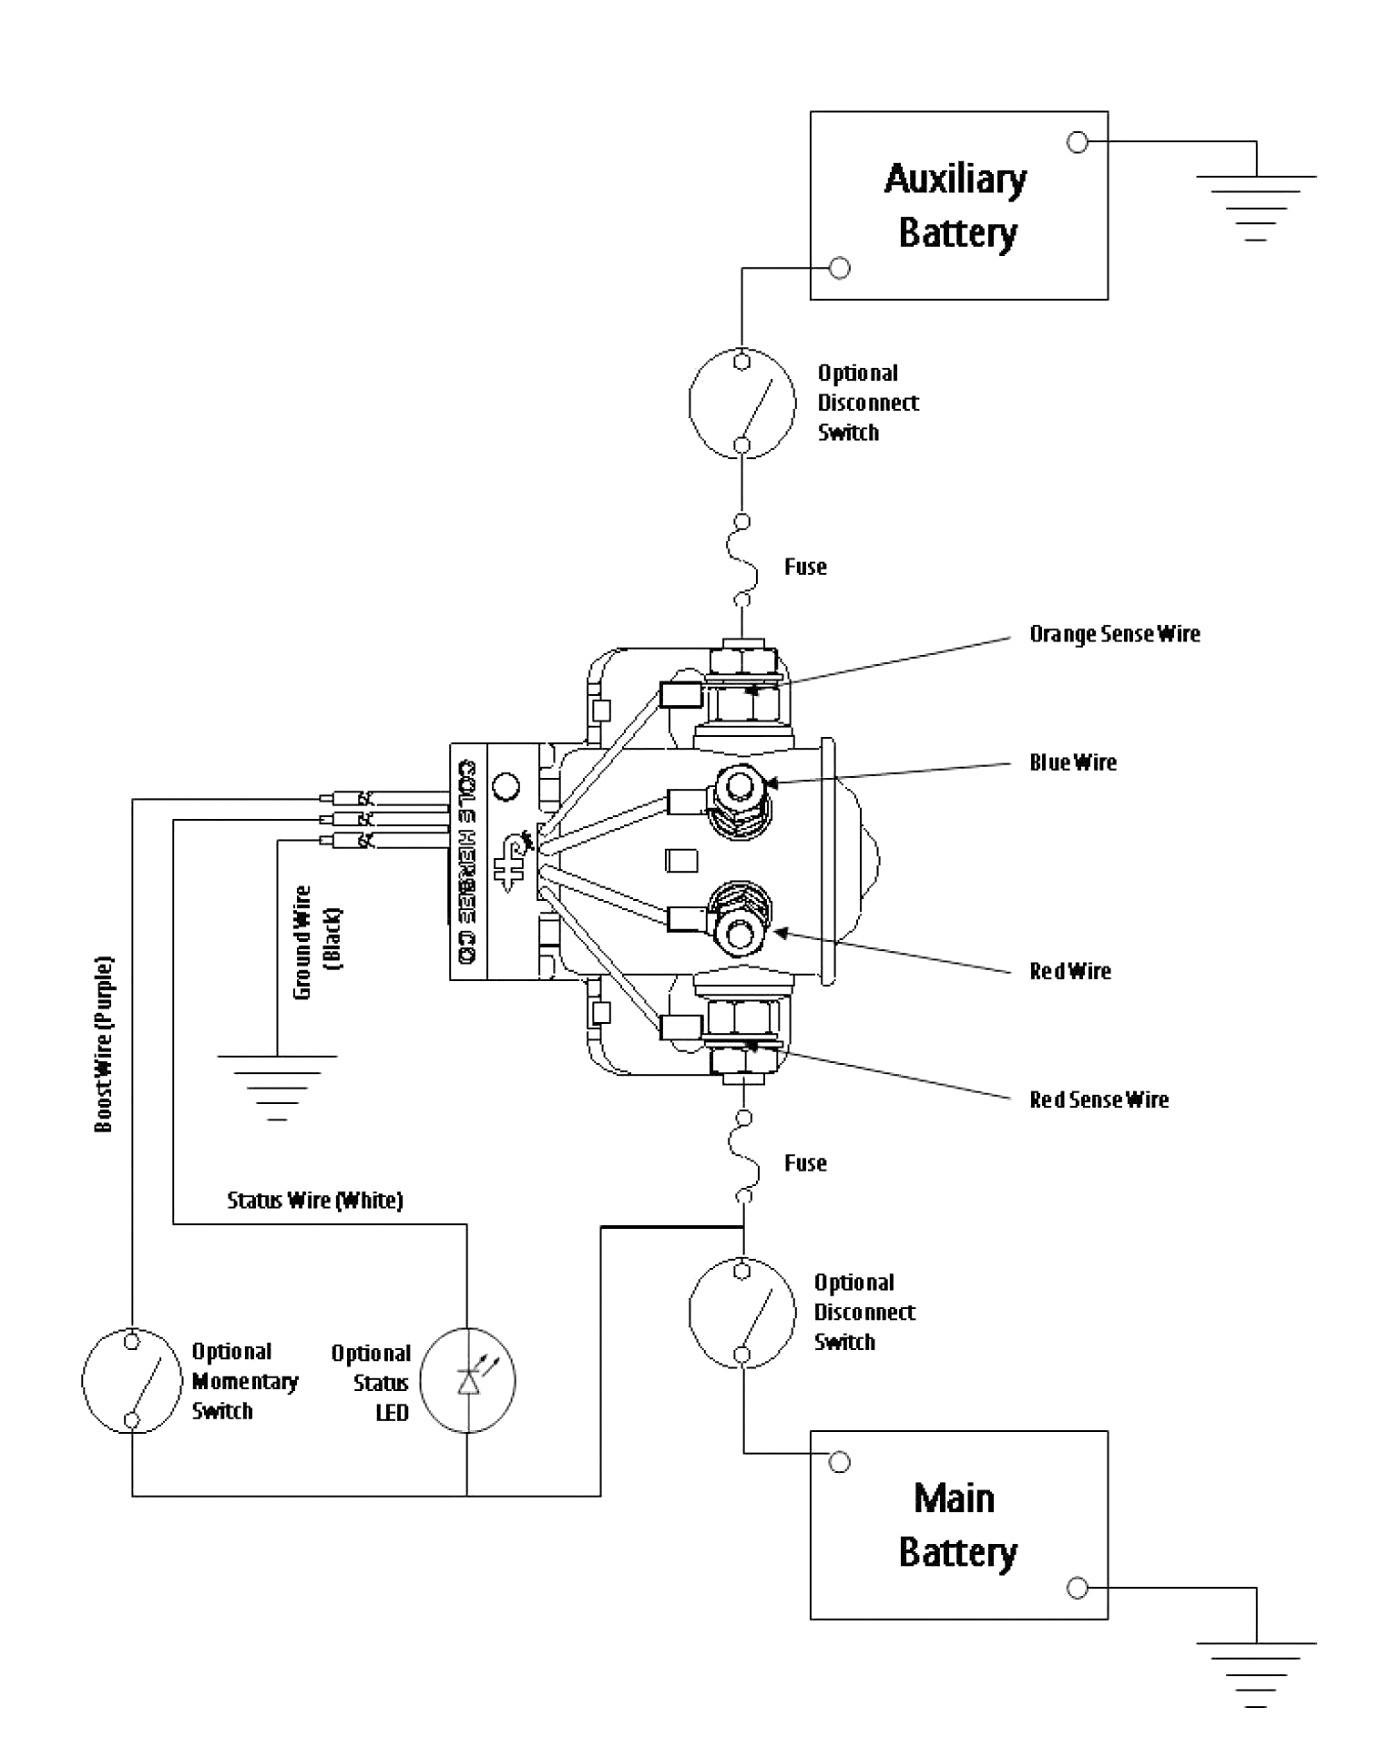 shore power wiring diagram mitsubishi lancer stereo marine elegant